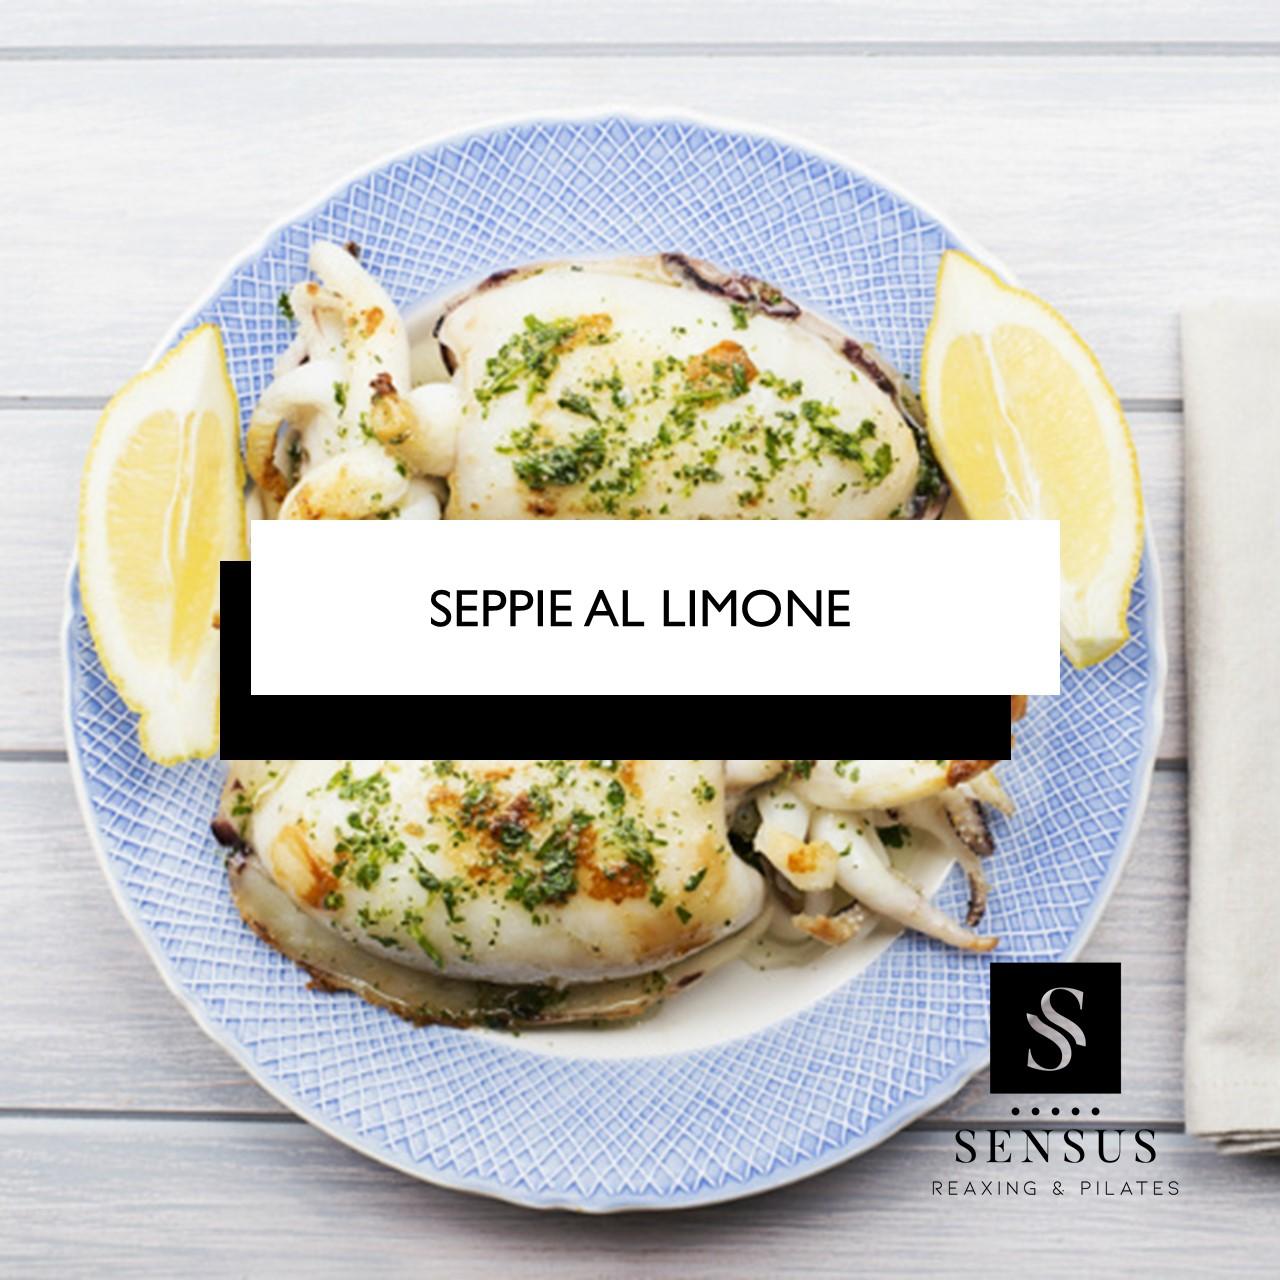 Seppie Al Limone